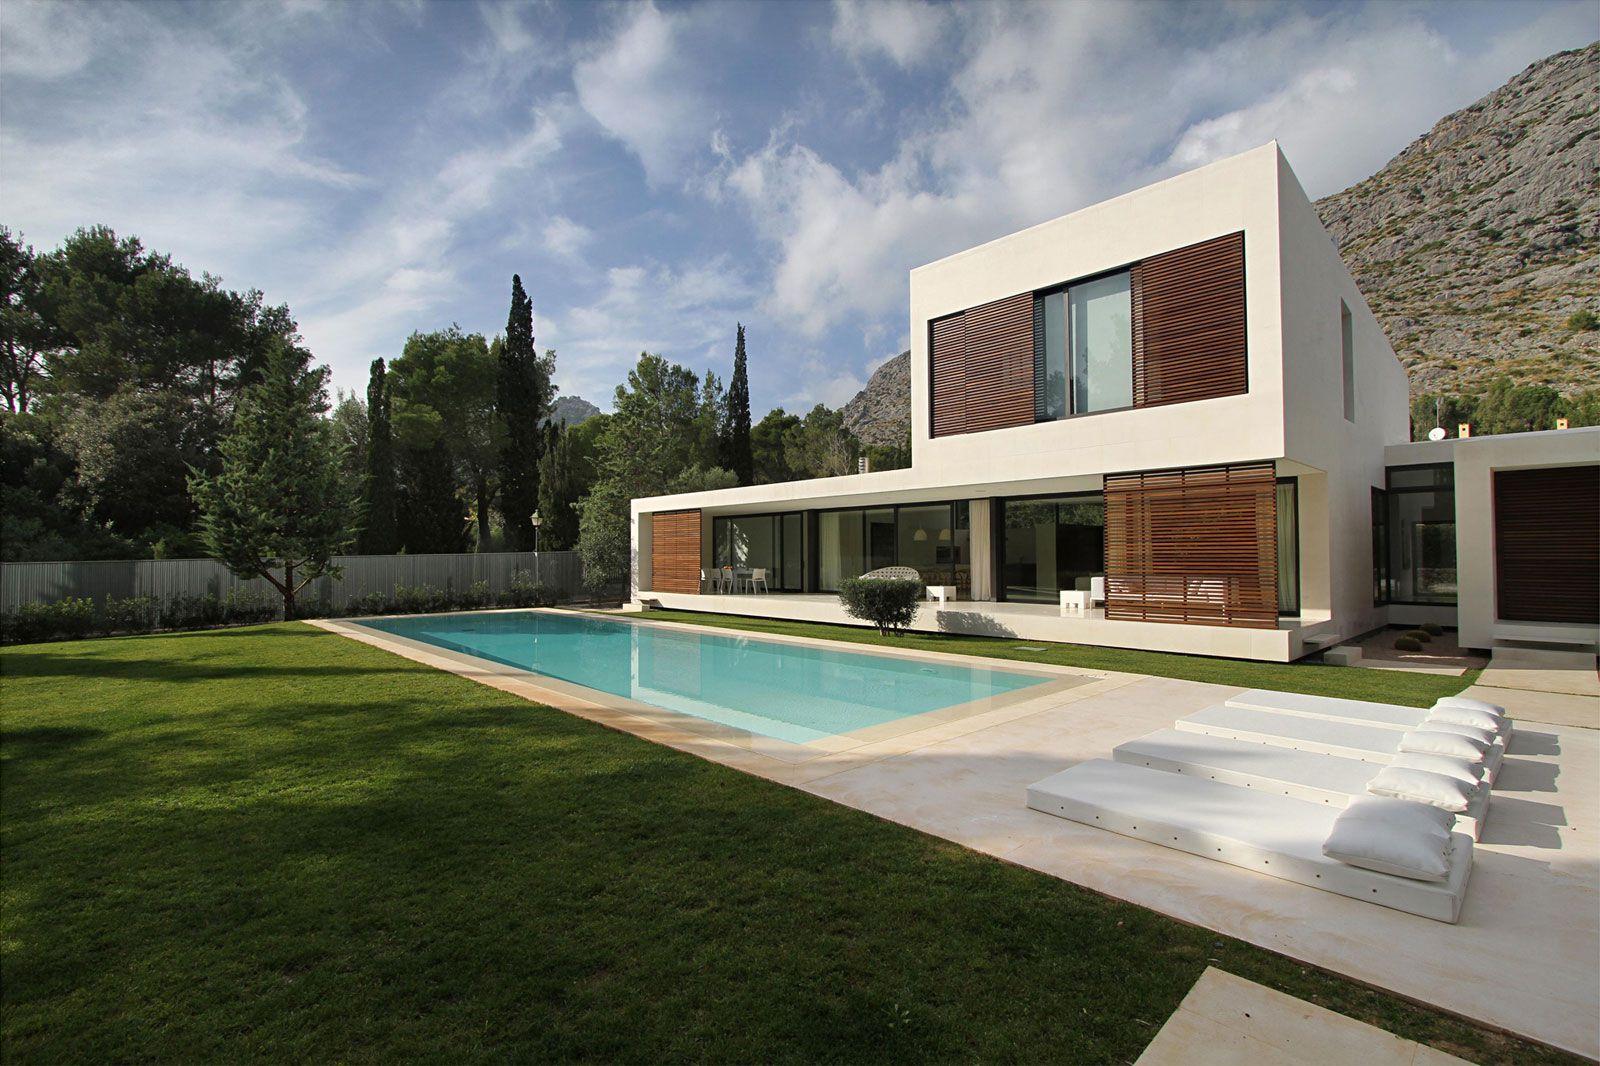 Casa-Bauzà-00-0